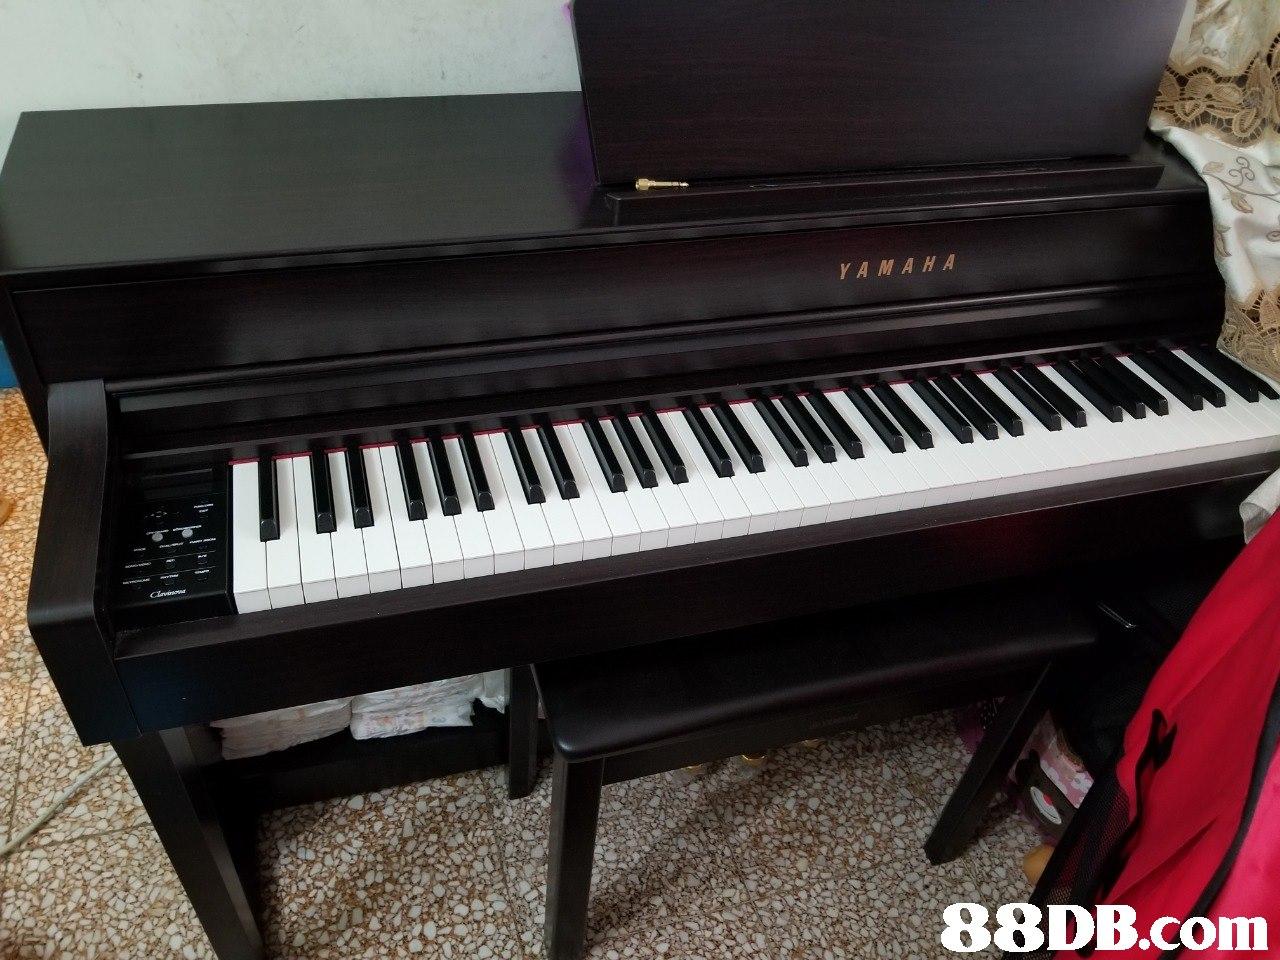 YAMAHA   Musical instrument,Piano,Electronic instrument,Keyboard,Musical instrument accessory